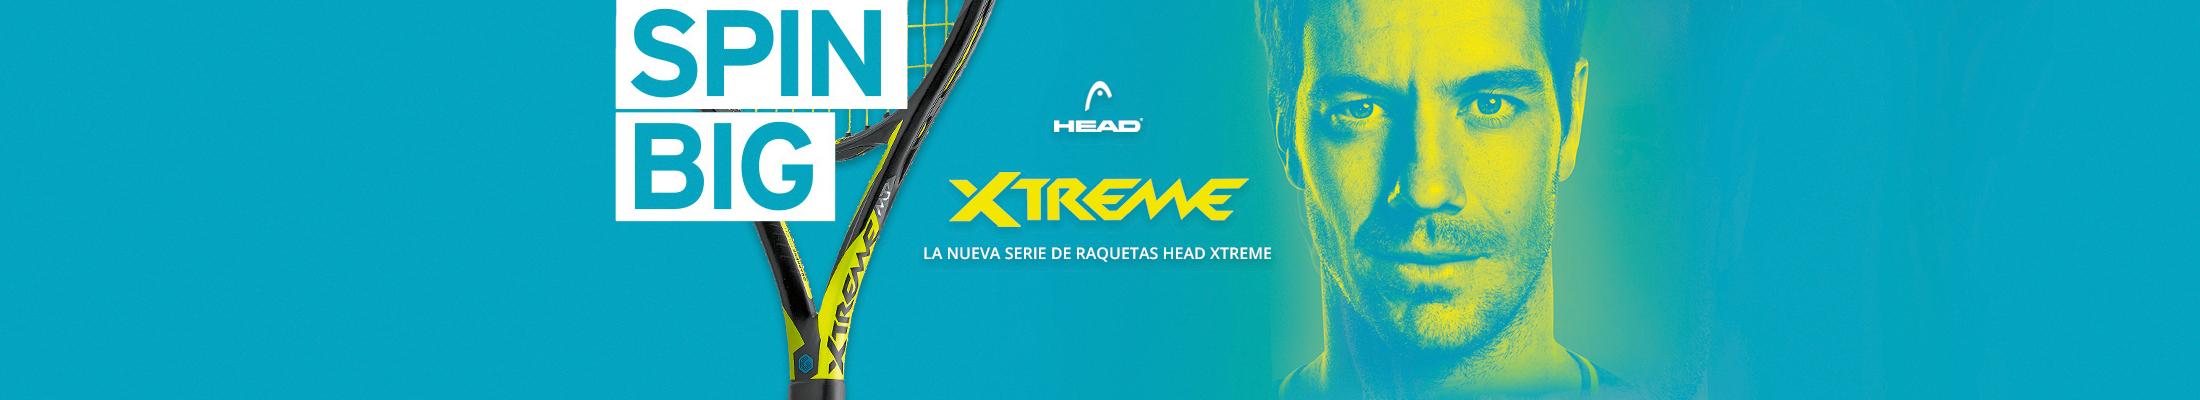 Head Xtreme raquetas